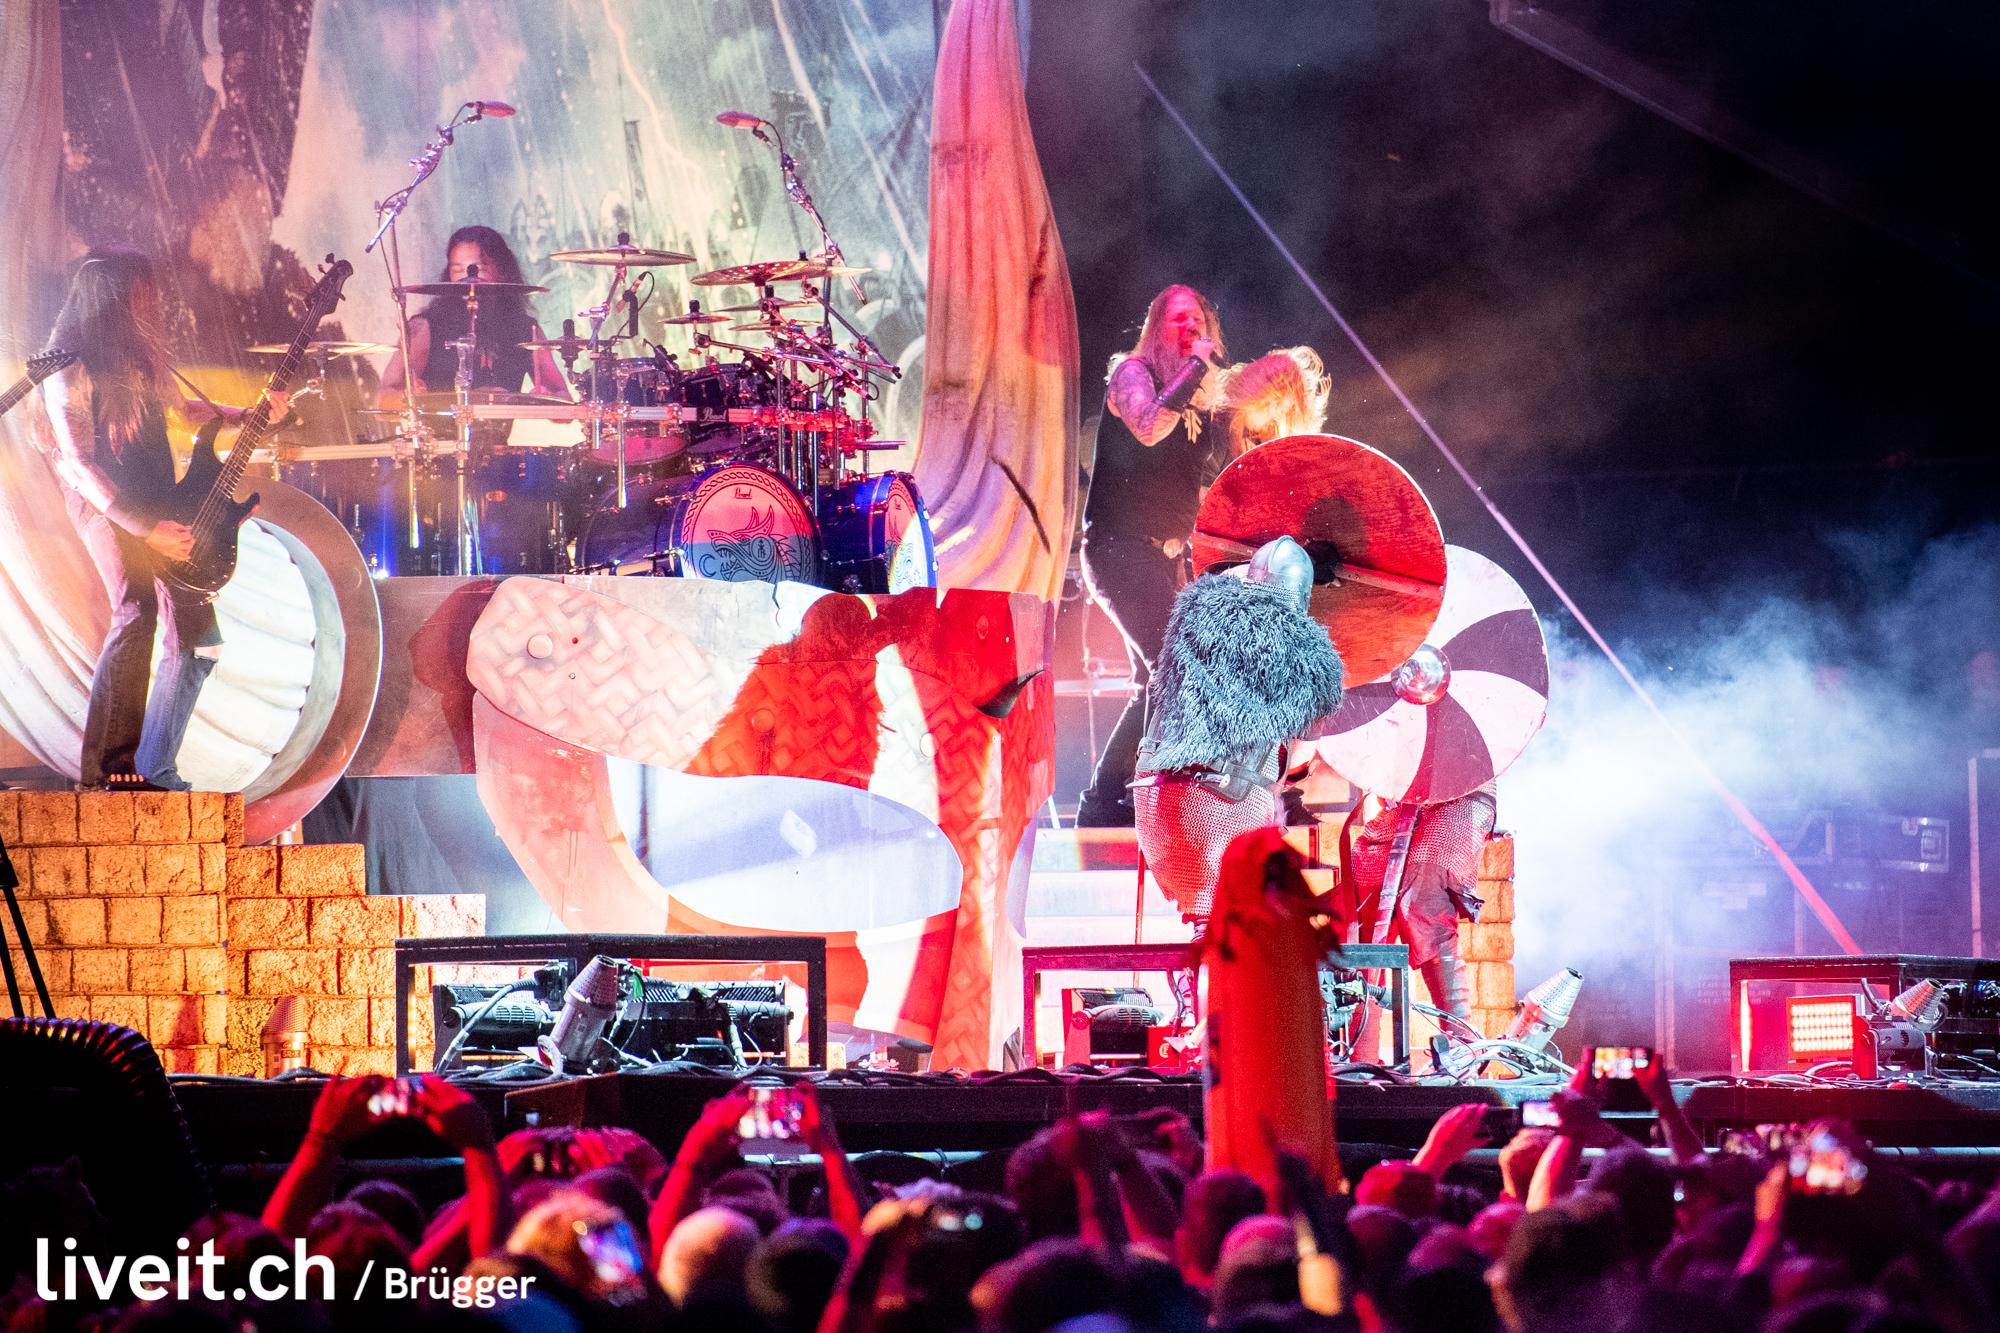 SCHWEIZ GREENFIELD FESTIVAL 2019 Amon Amarth